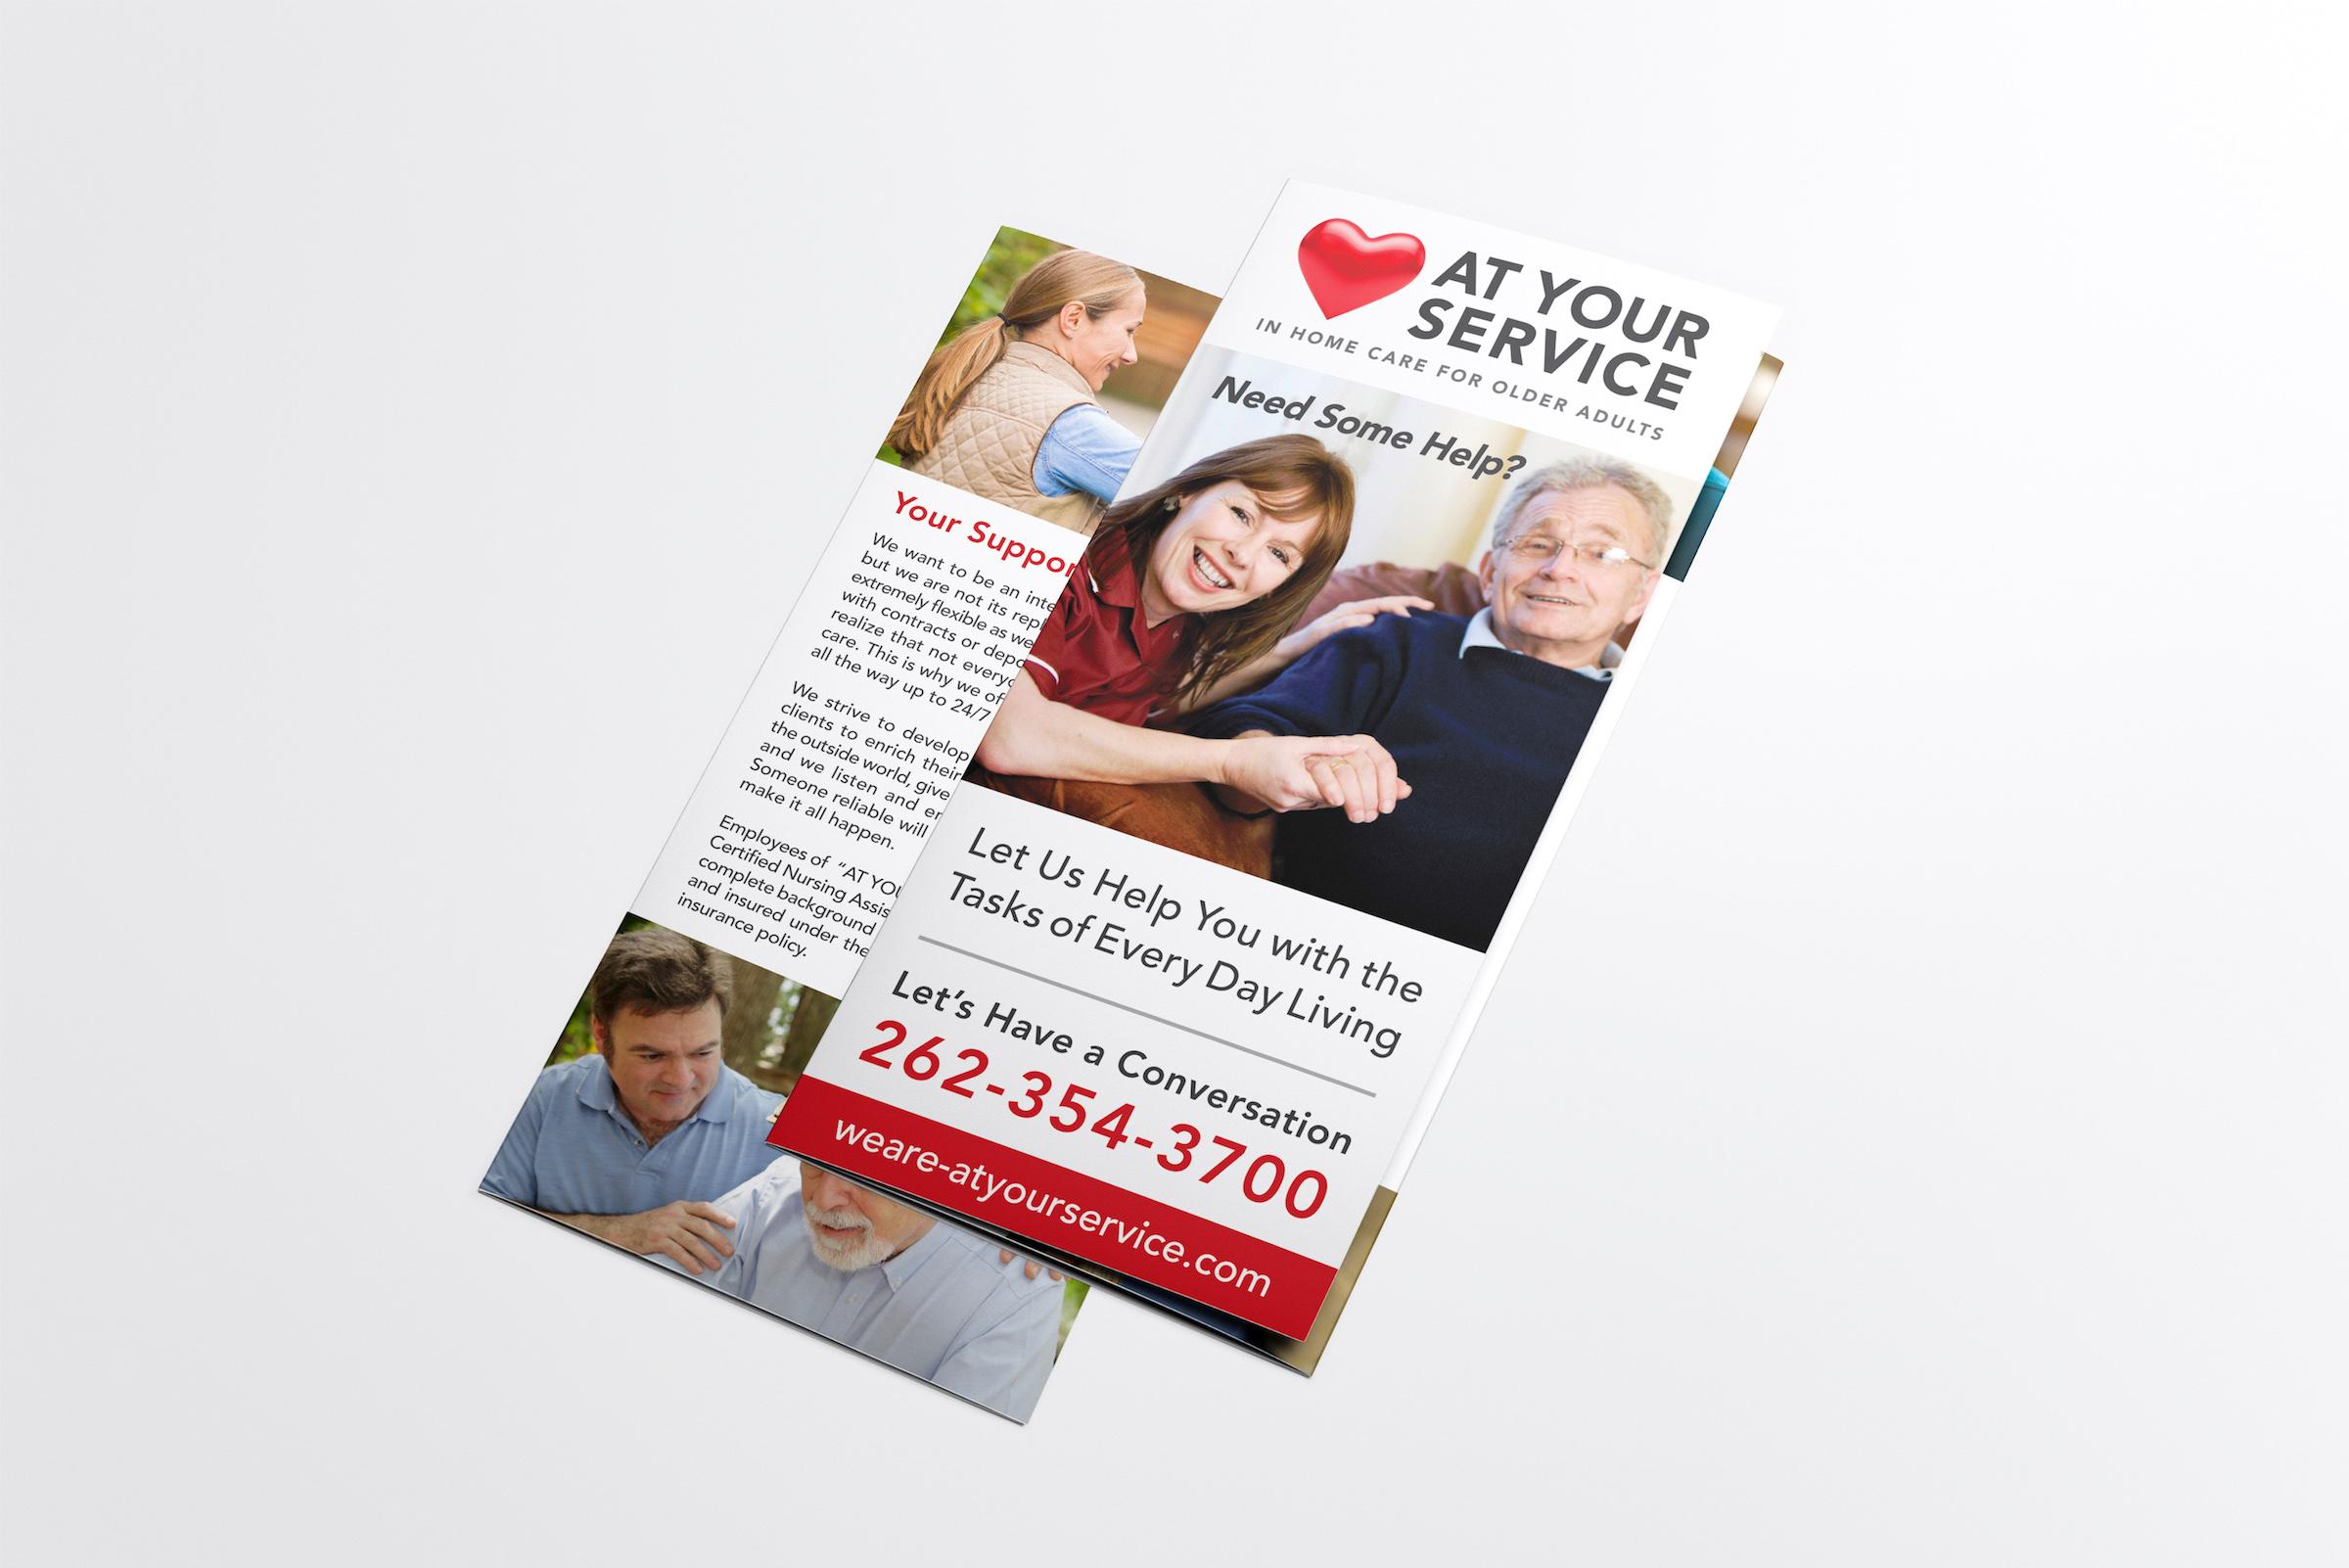 Golden-Antler-Graphic-Design-Milwaukee-Web-Branding-Marketing-Wisconsin-At-Your-Service-Brochure-Printing